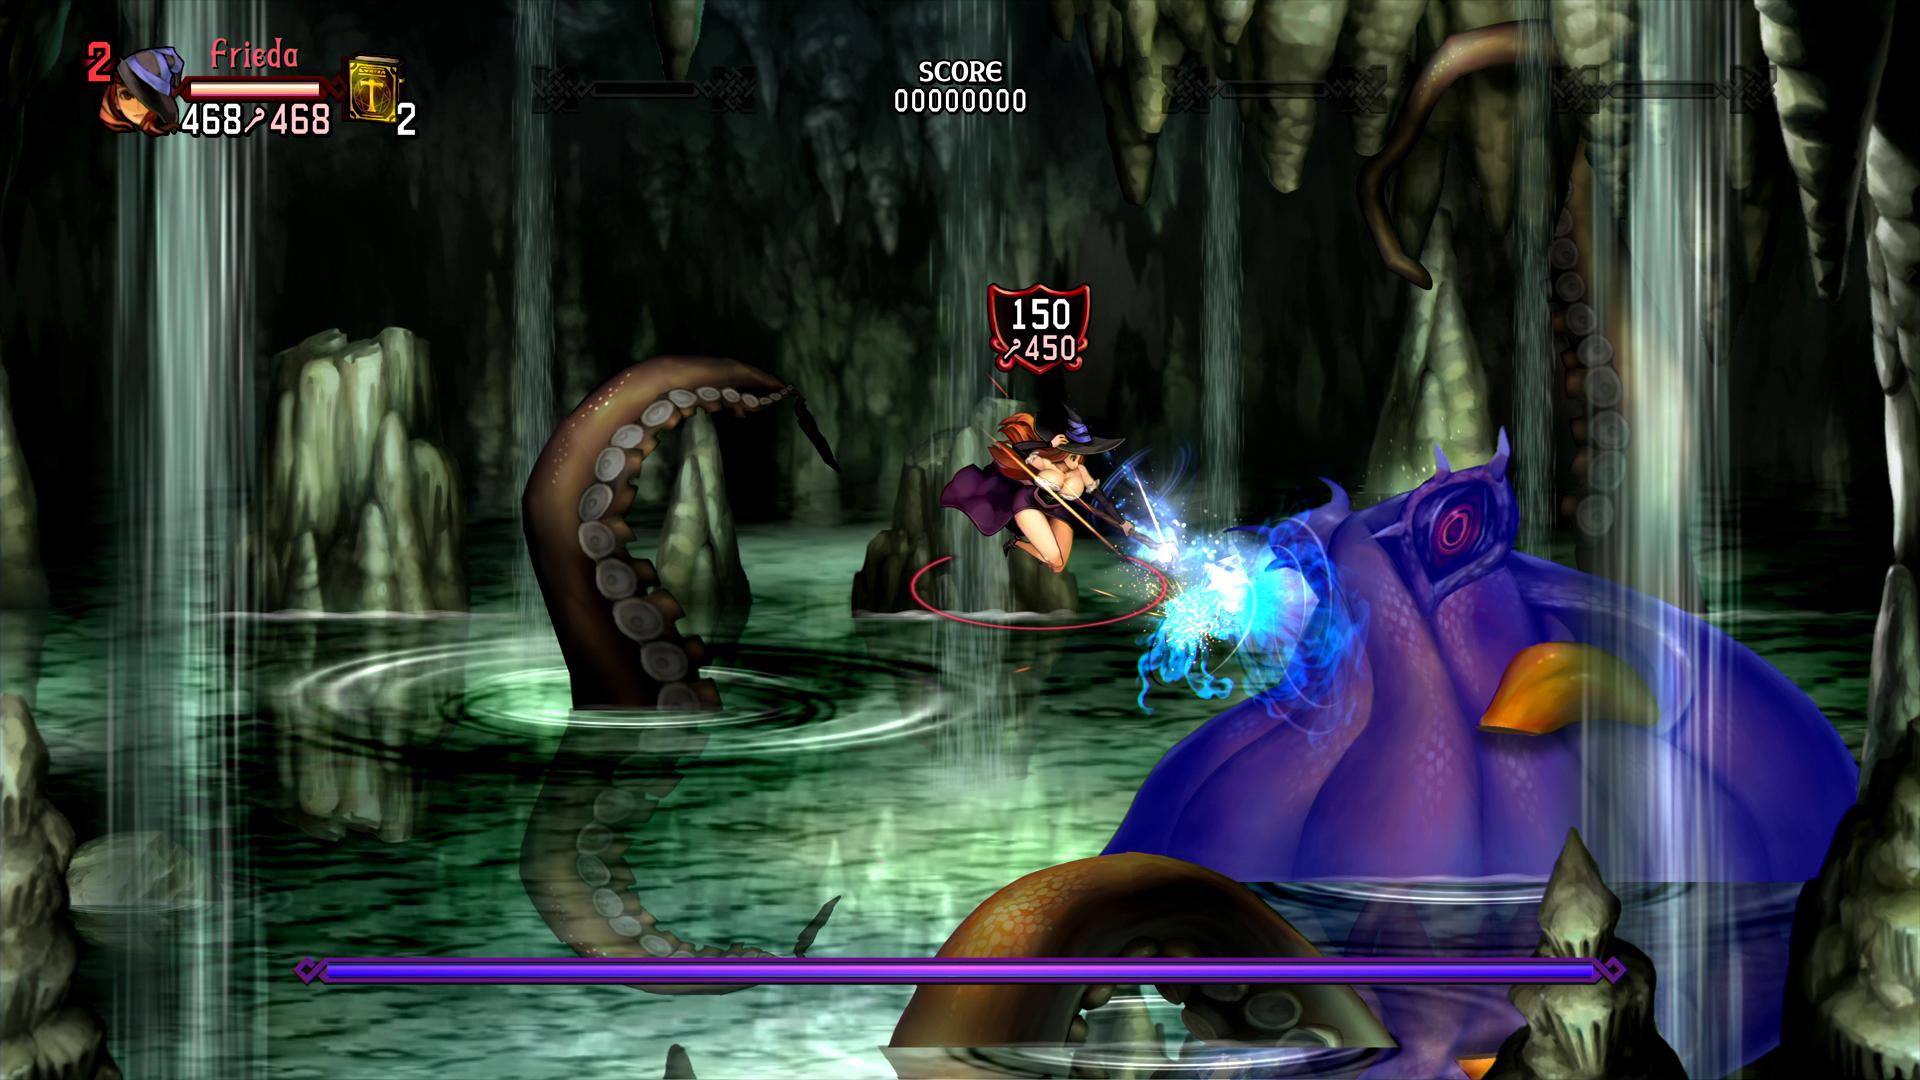 Dragon's Crown Pro - Frieda